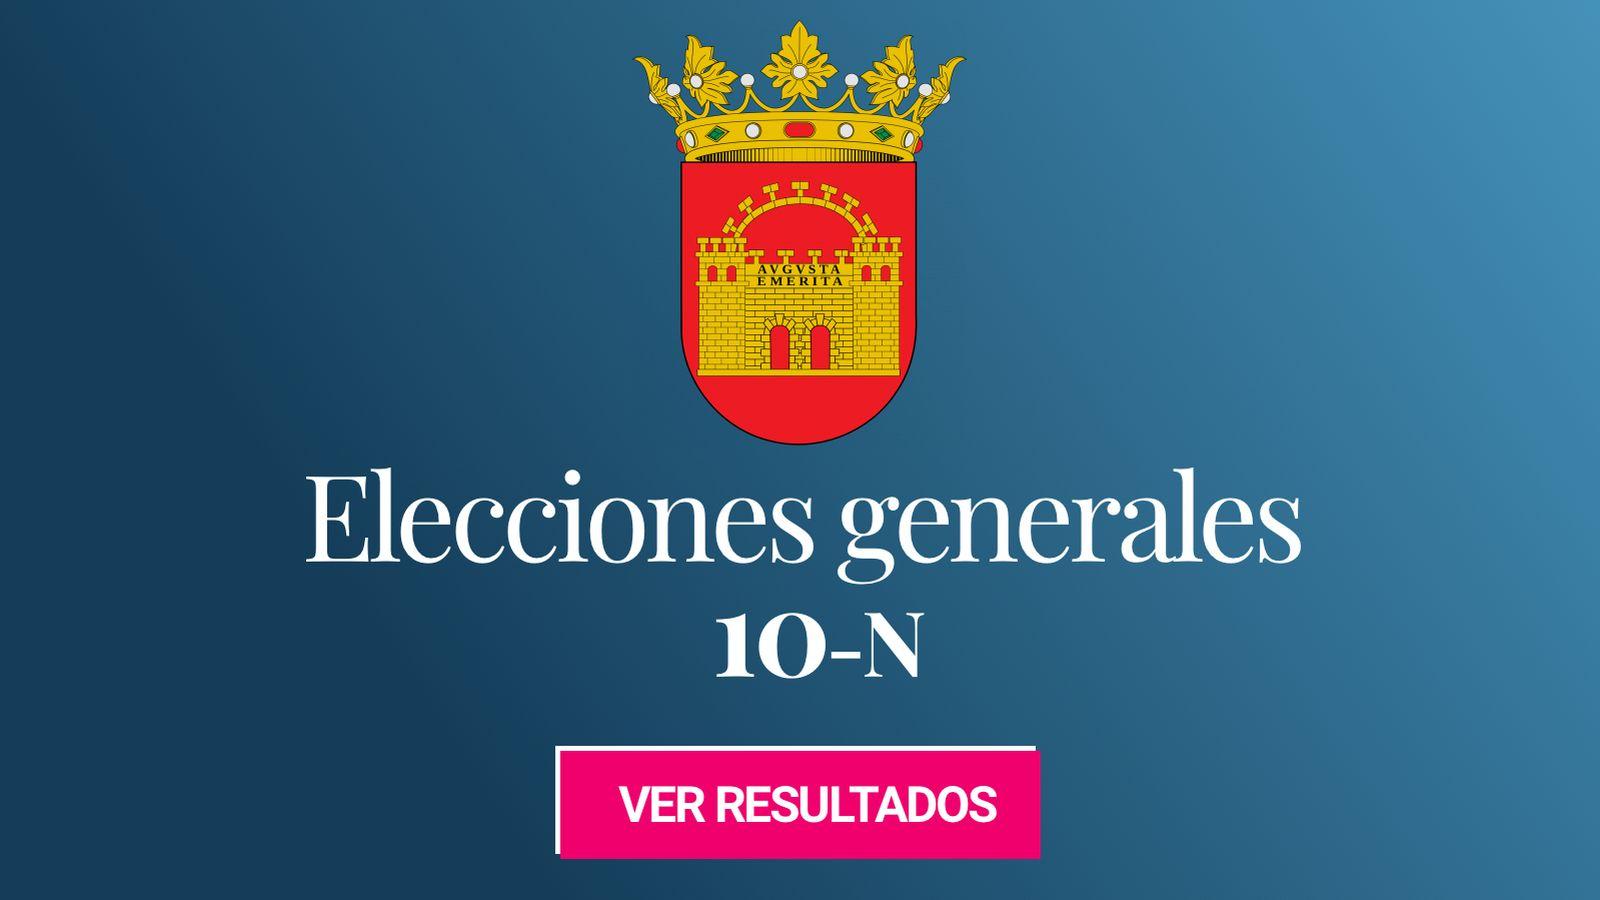 Foto: Elecciones generales 2019 en Mérida. (C.C./EC)